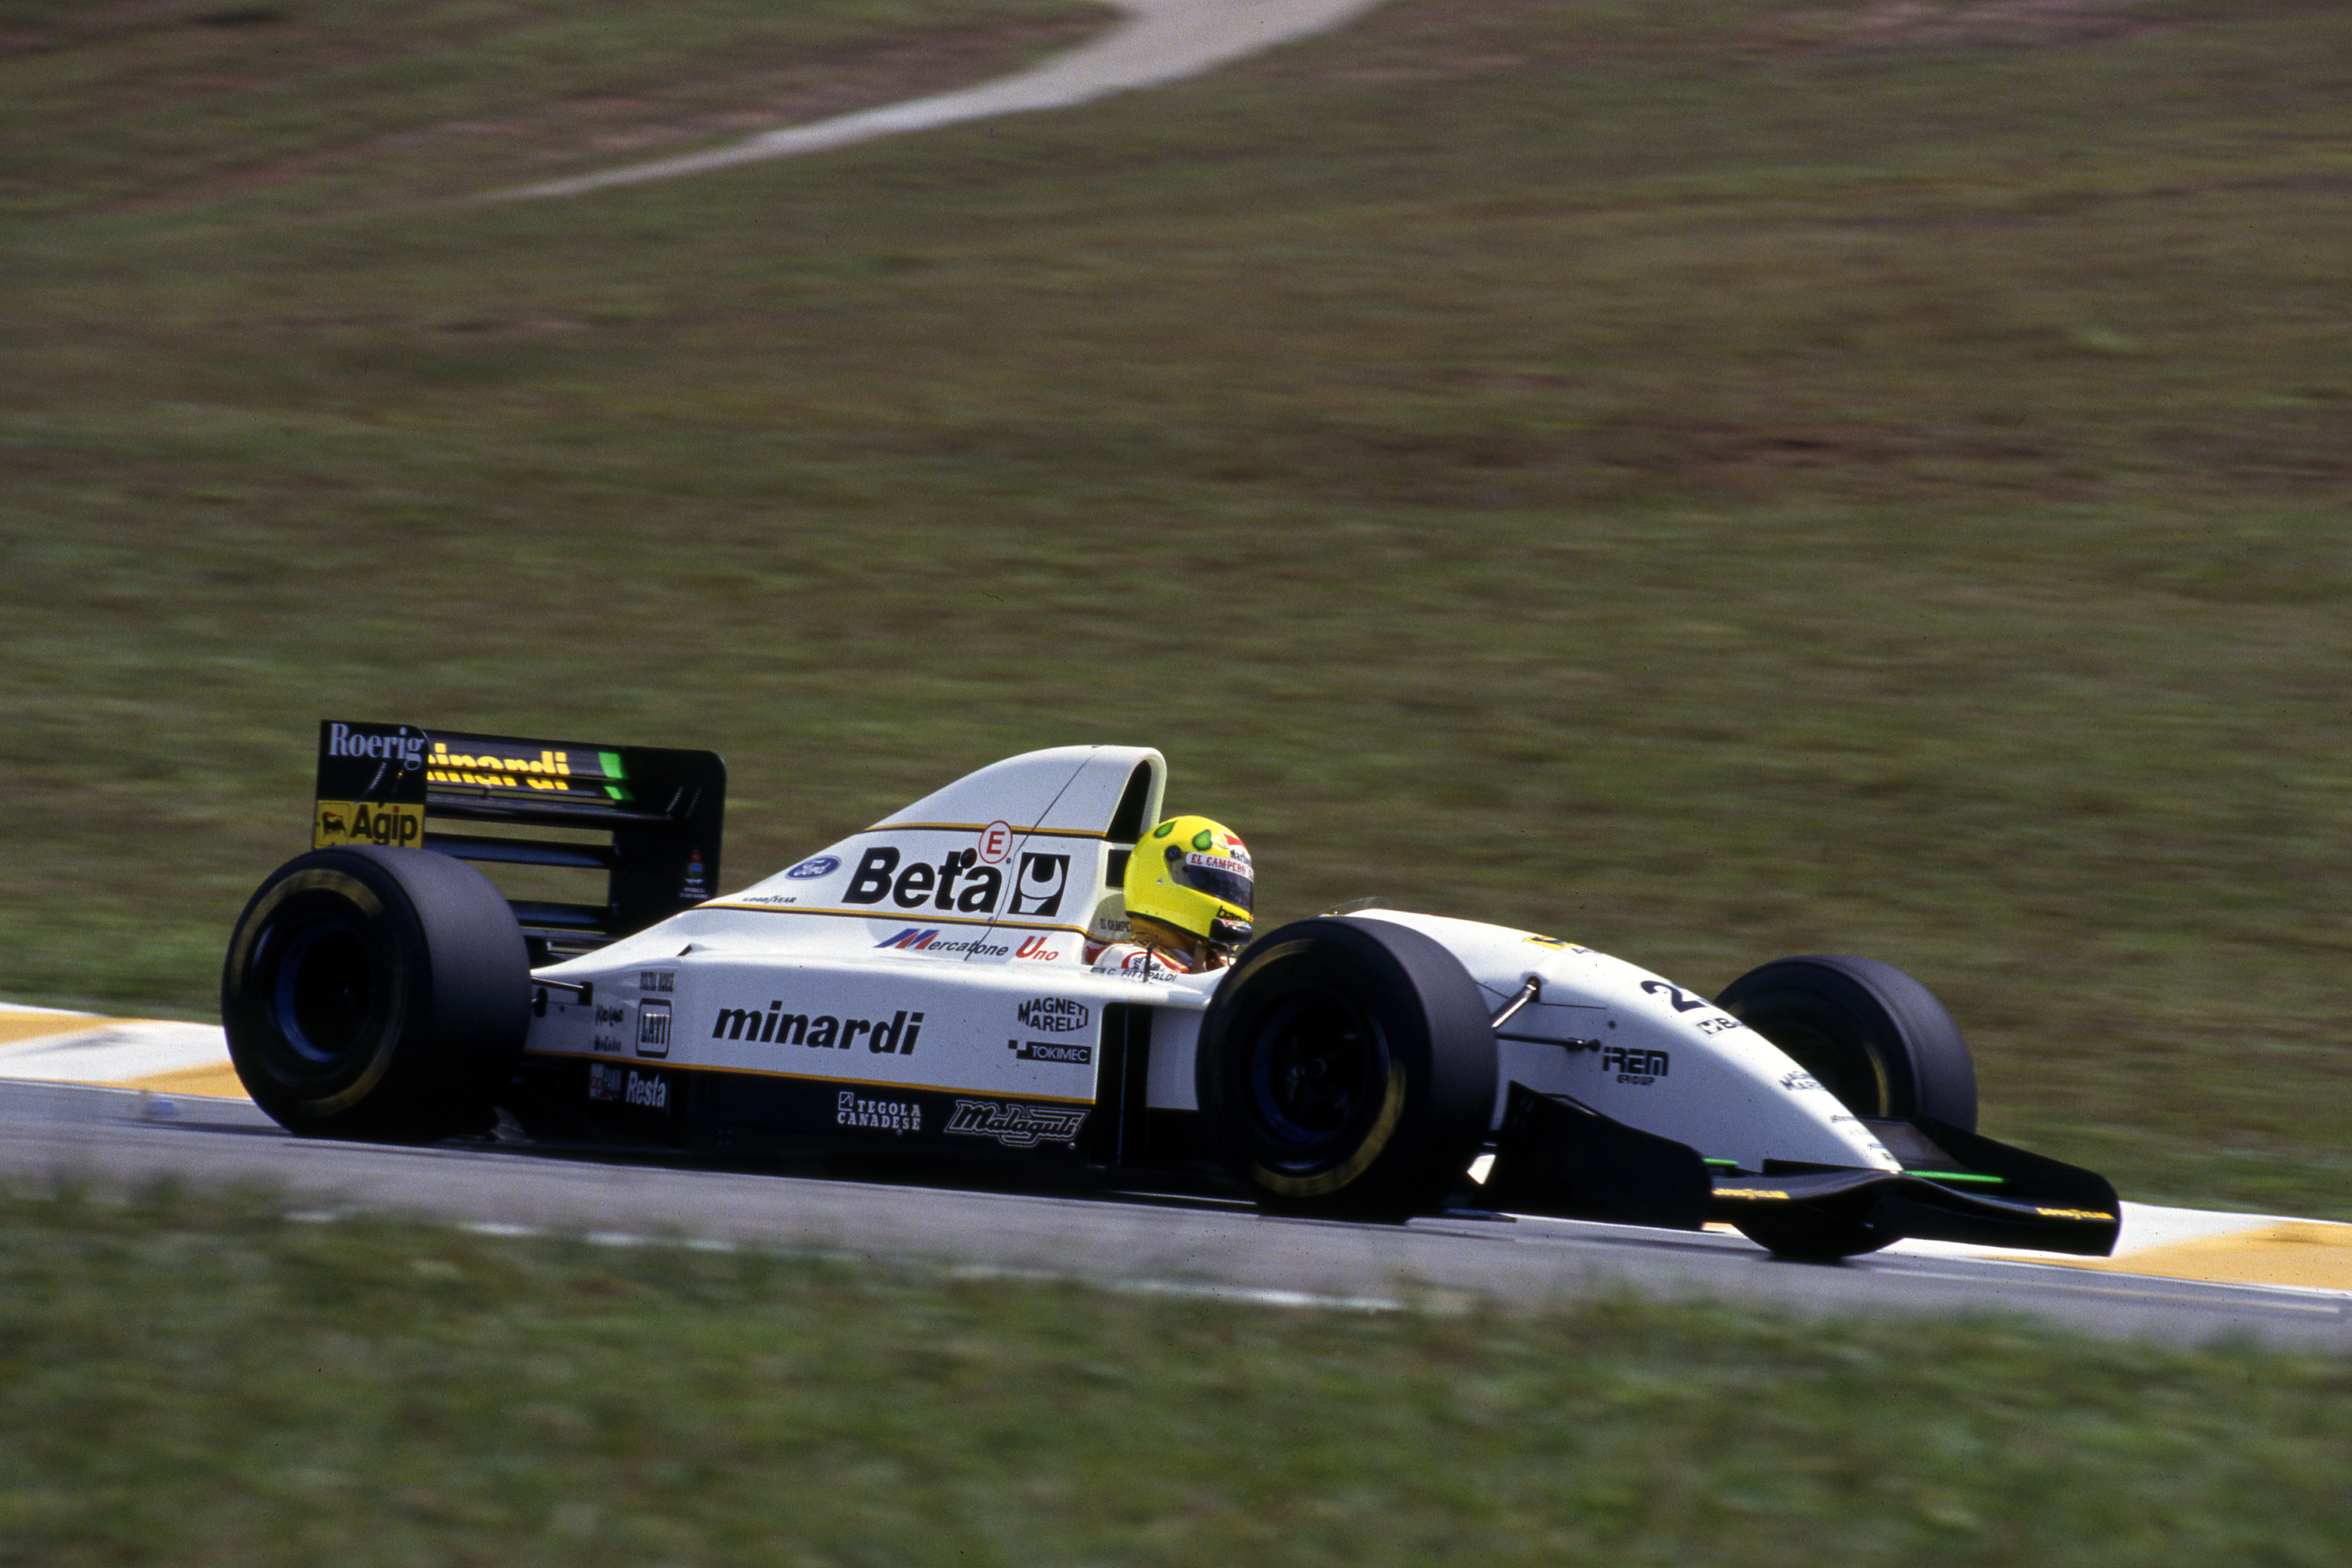 Brazilian Grand Prix Interlagos (bra) 26 28 03 1993